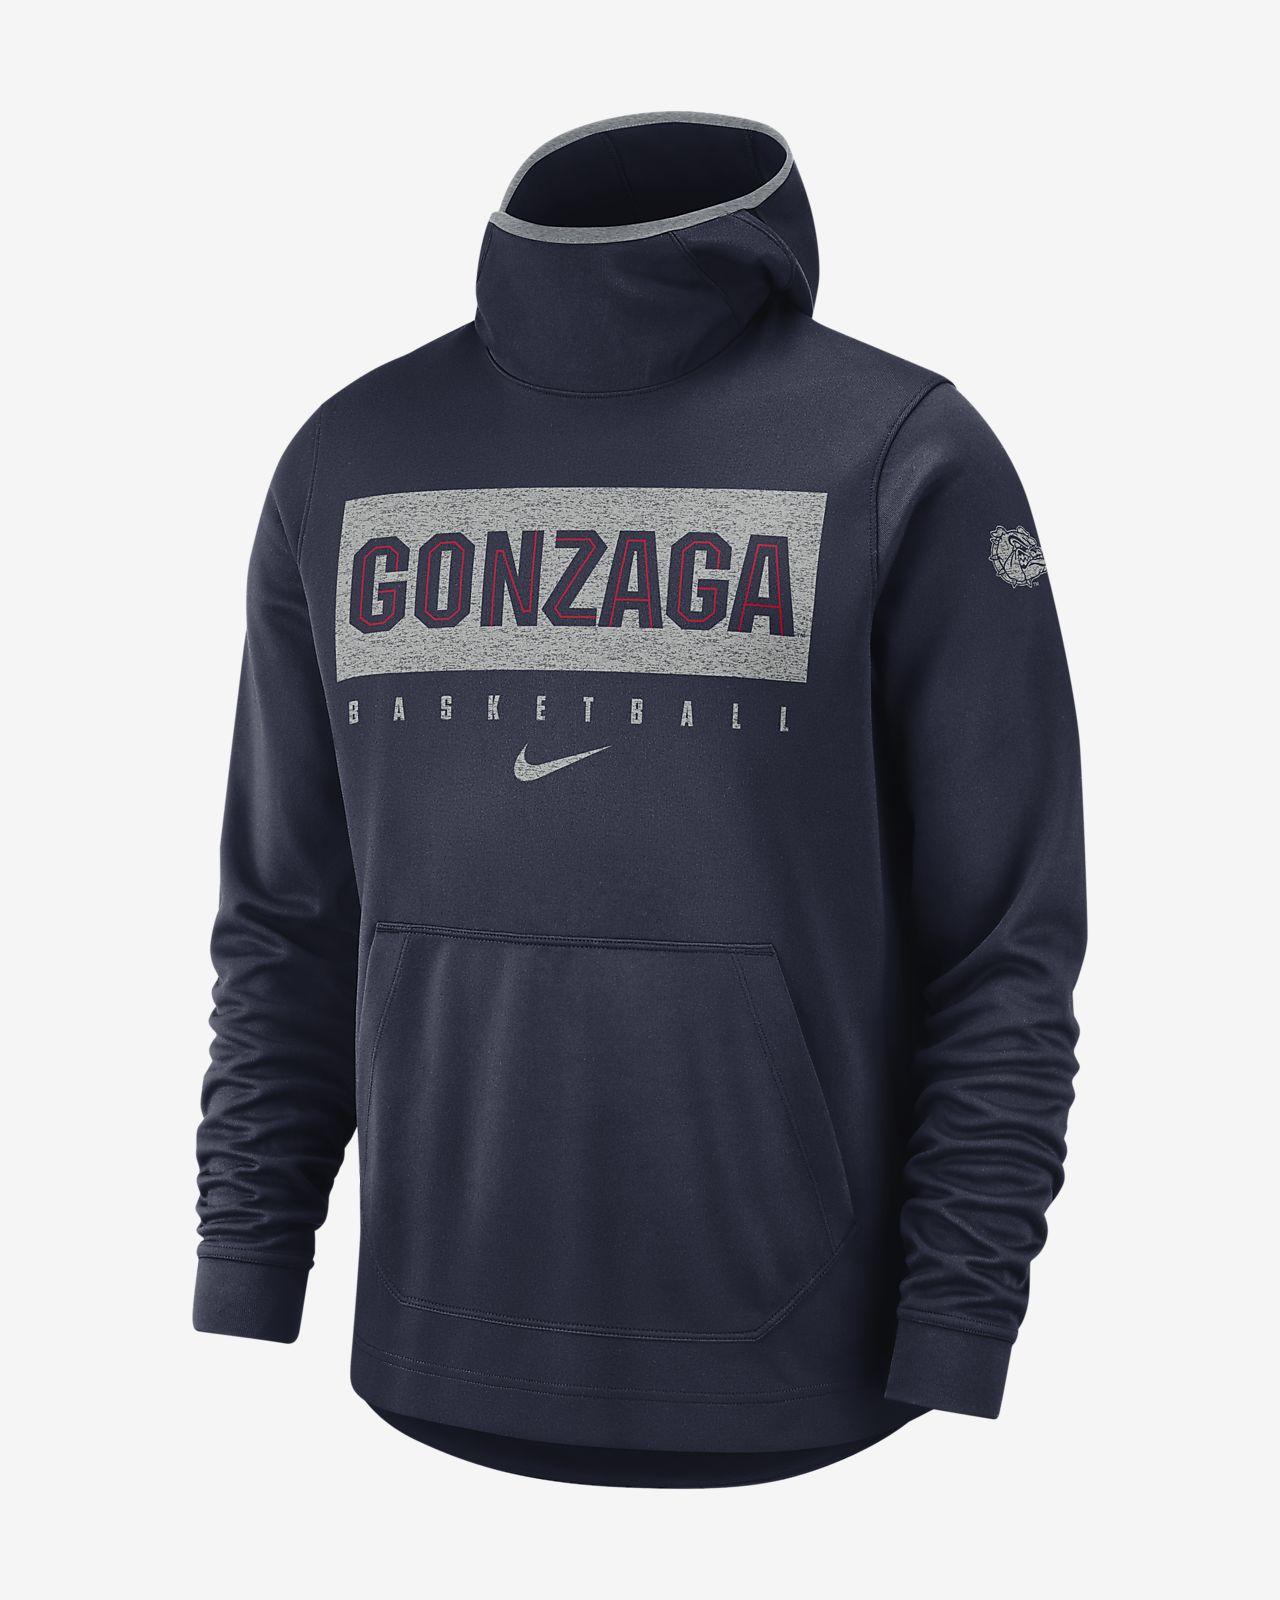 Nike College Spotlight (Gonzaga) Men's Pullover Hoodie